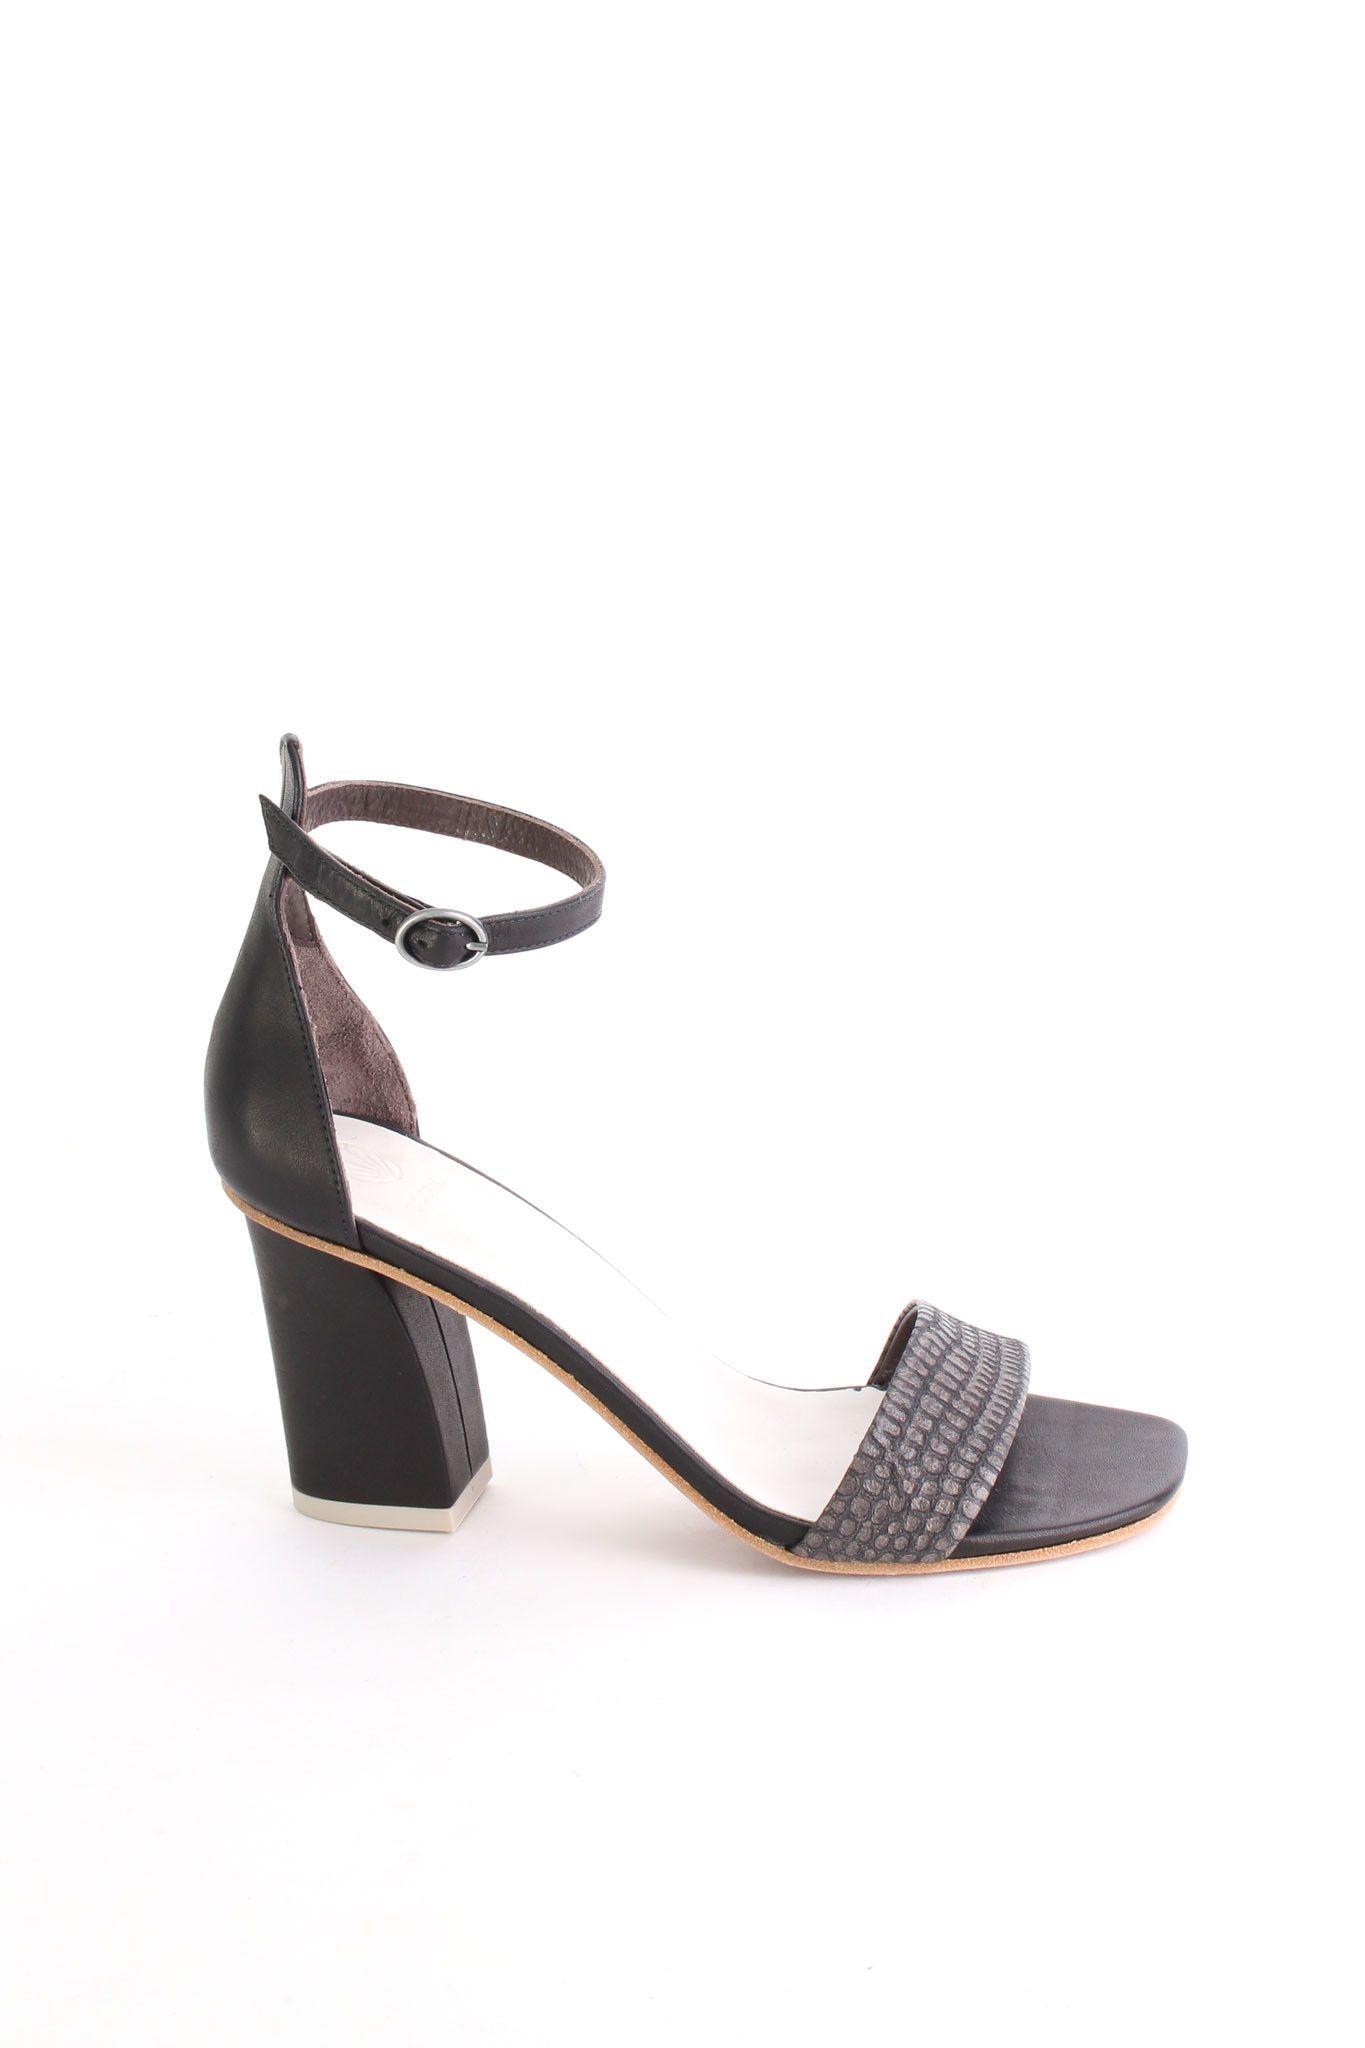 Caper sandal in Tejus Carbone/black